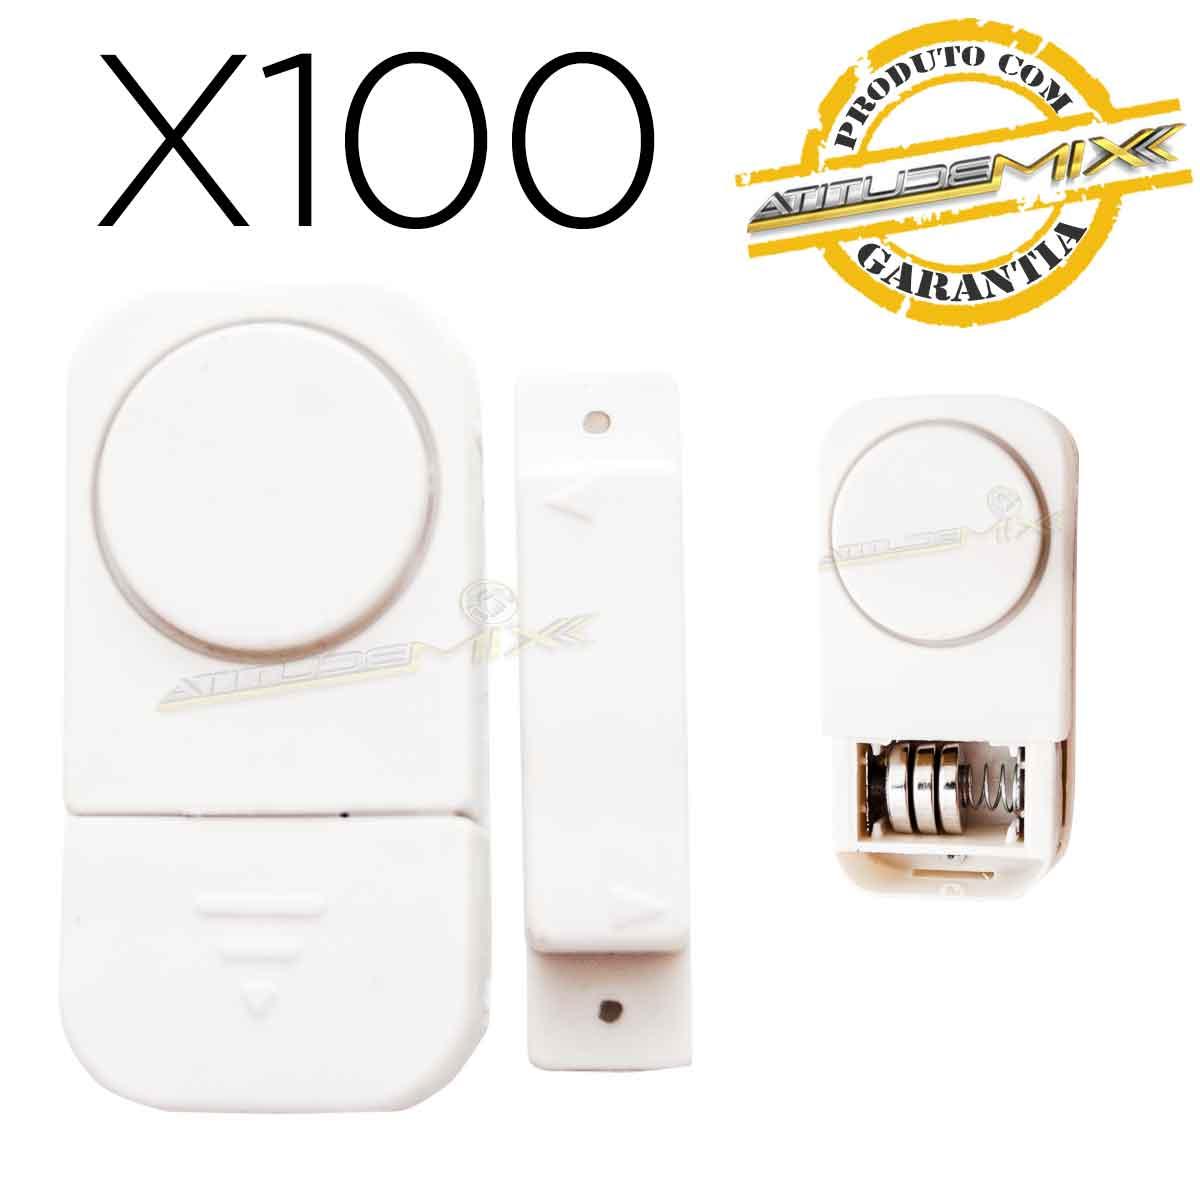 Kit 100 Alarmes Contra Invasão Sonoro Porta Janela Sem Fios